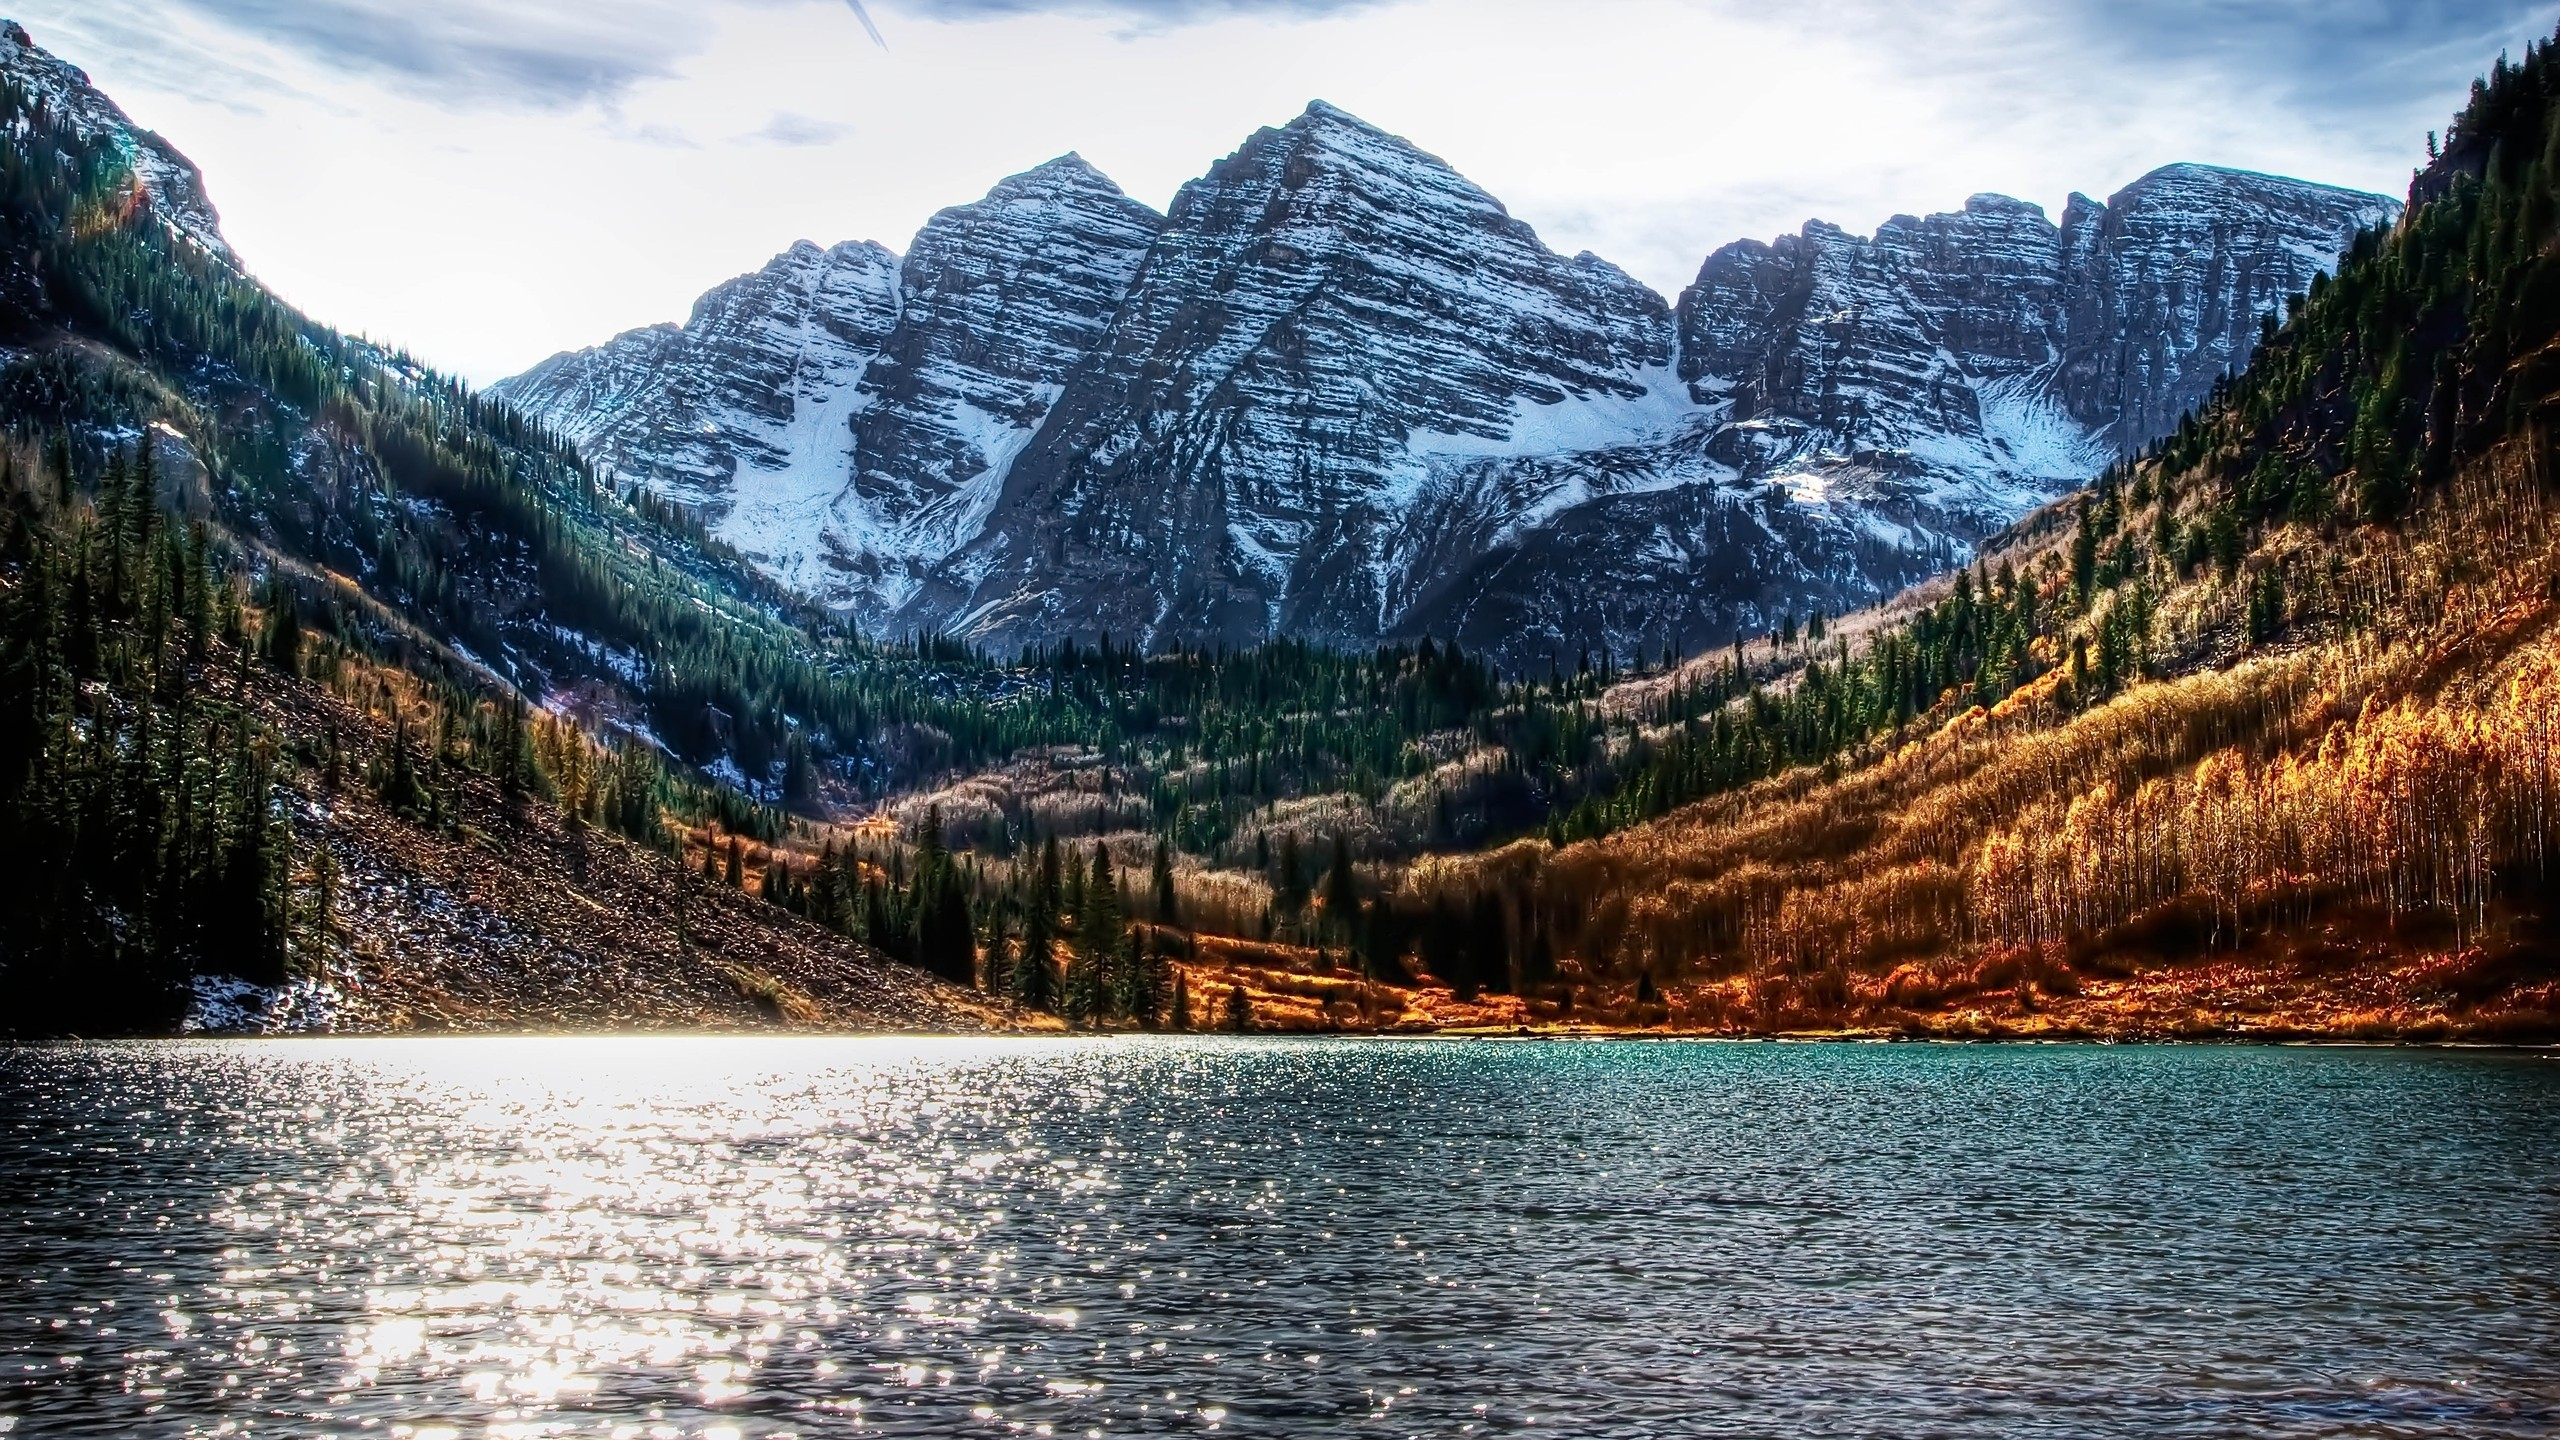 General 2560x1440 landscape lake fall mountains pine trees snowy mountain